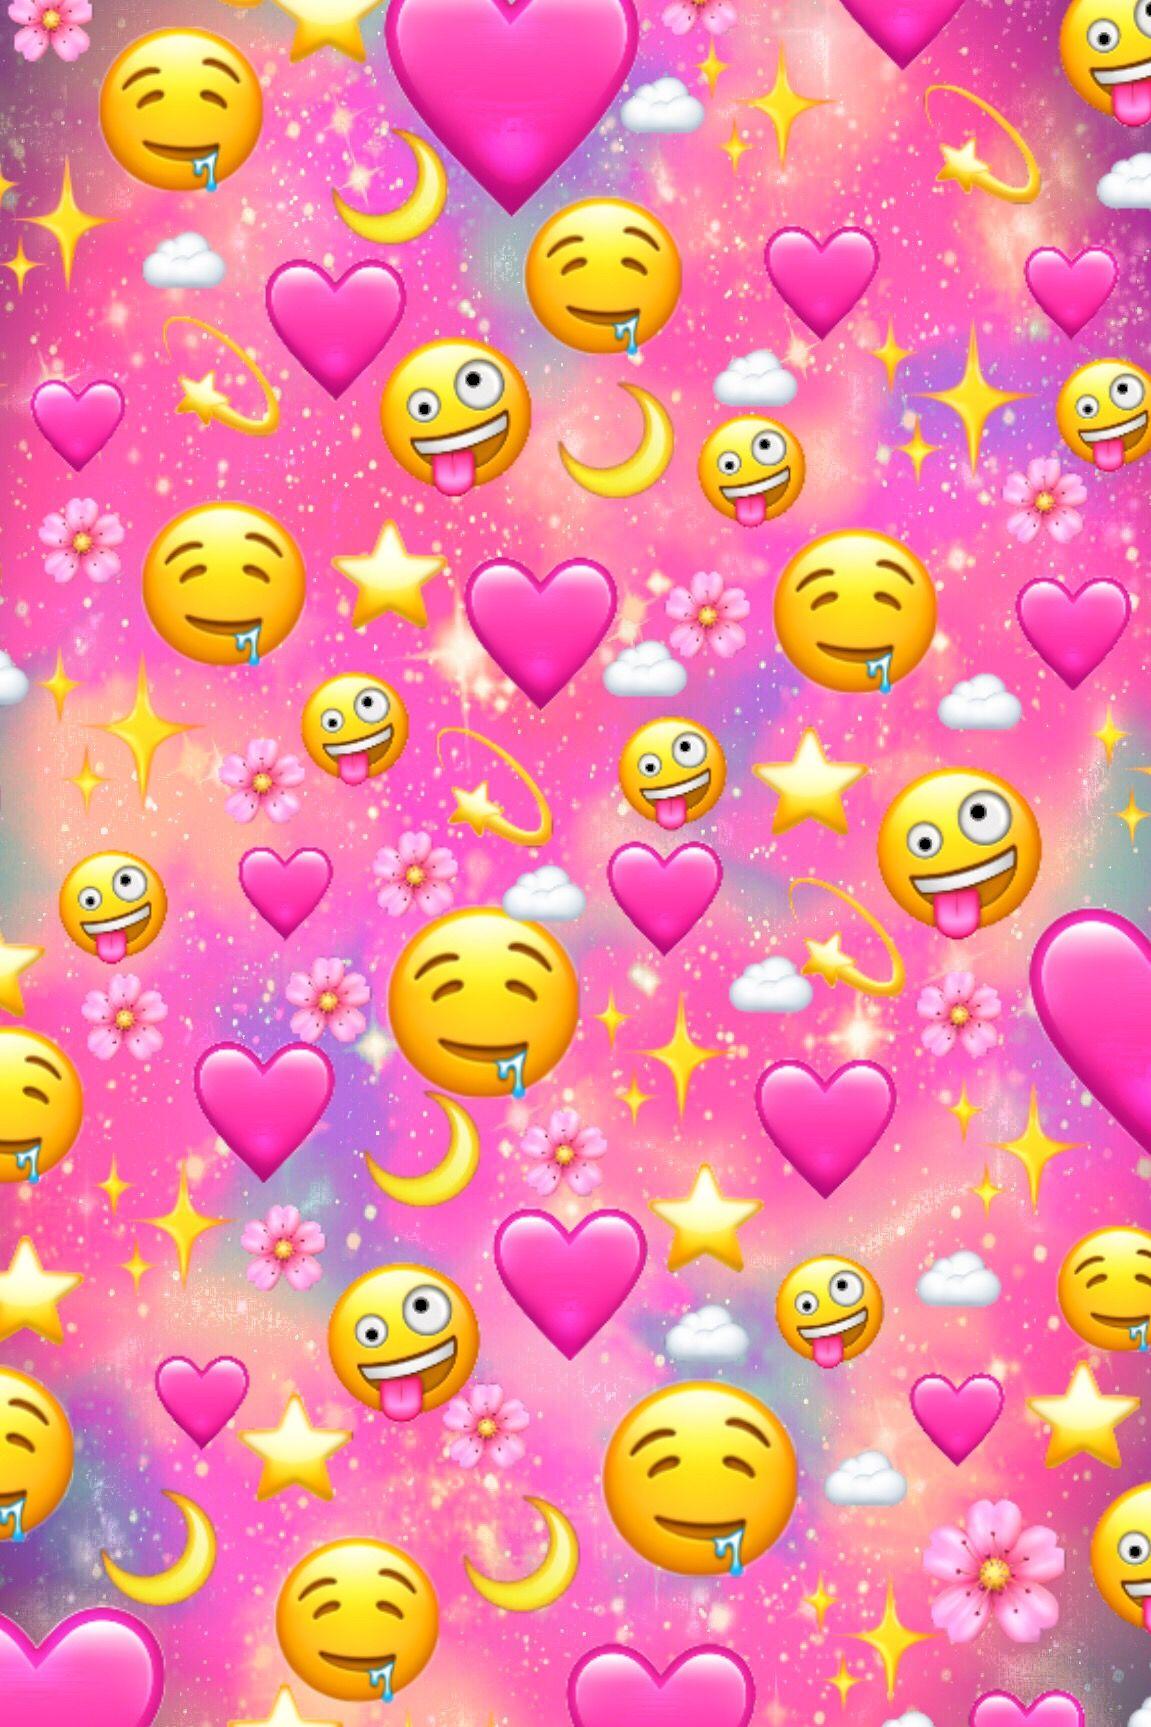 Love Hearts And Emojis Galaxy Wallpaper